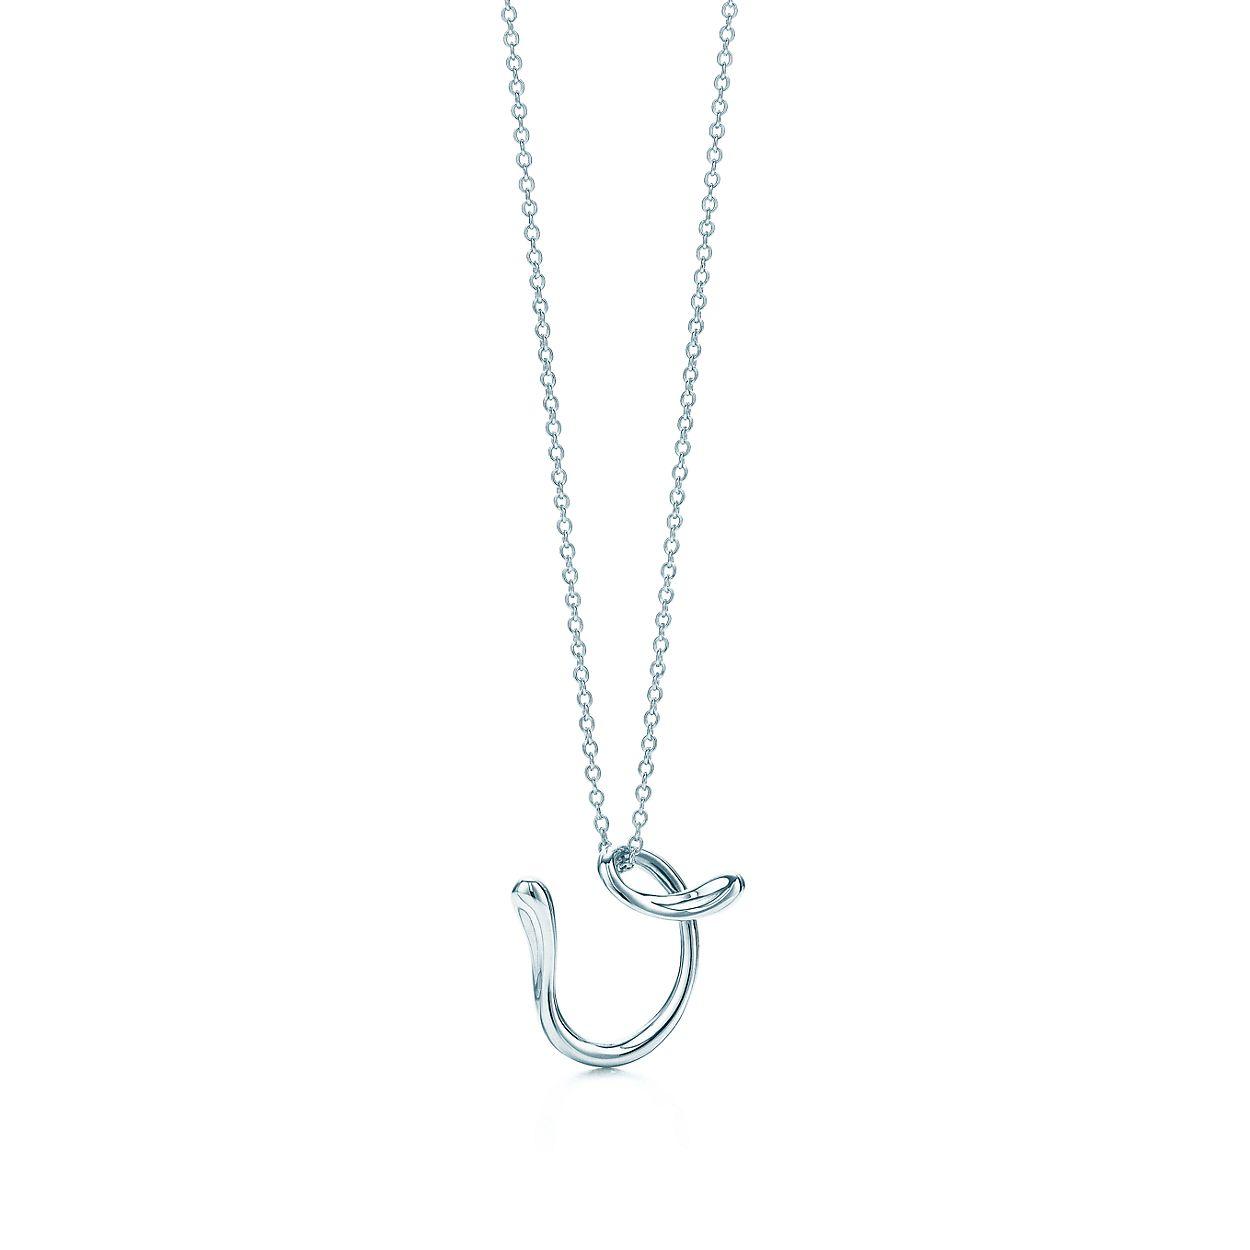 Elsa Peretti letter V pendant in sterling silver, small - Size V Tiffany & Co.